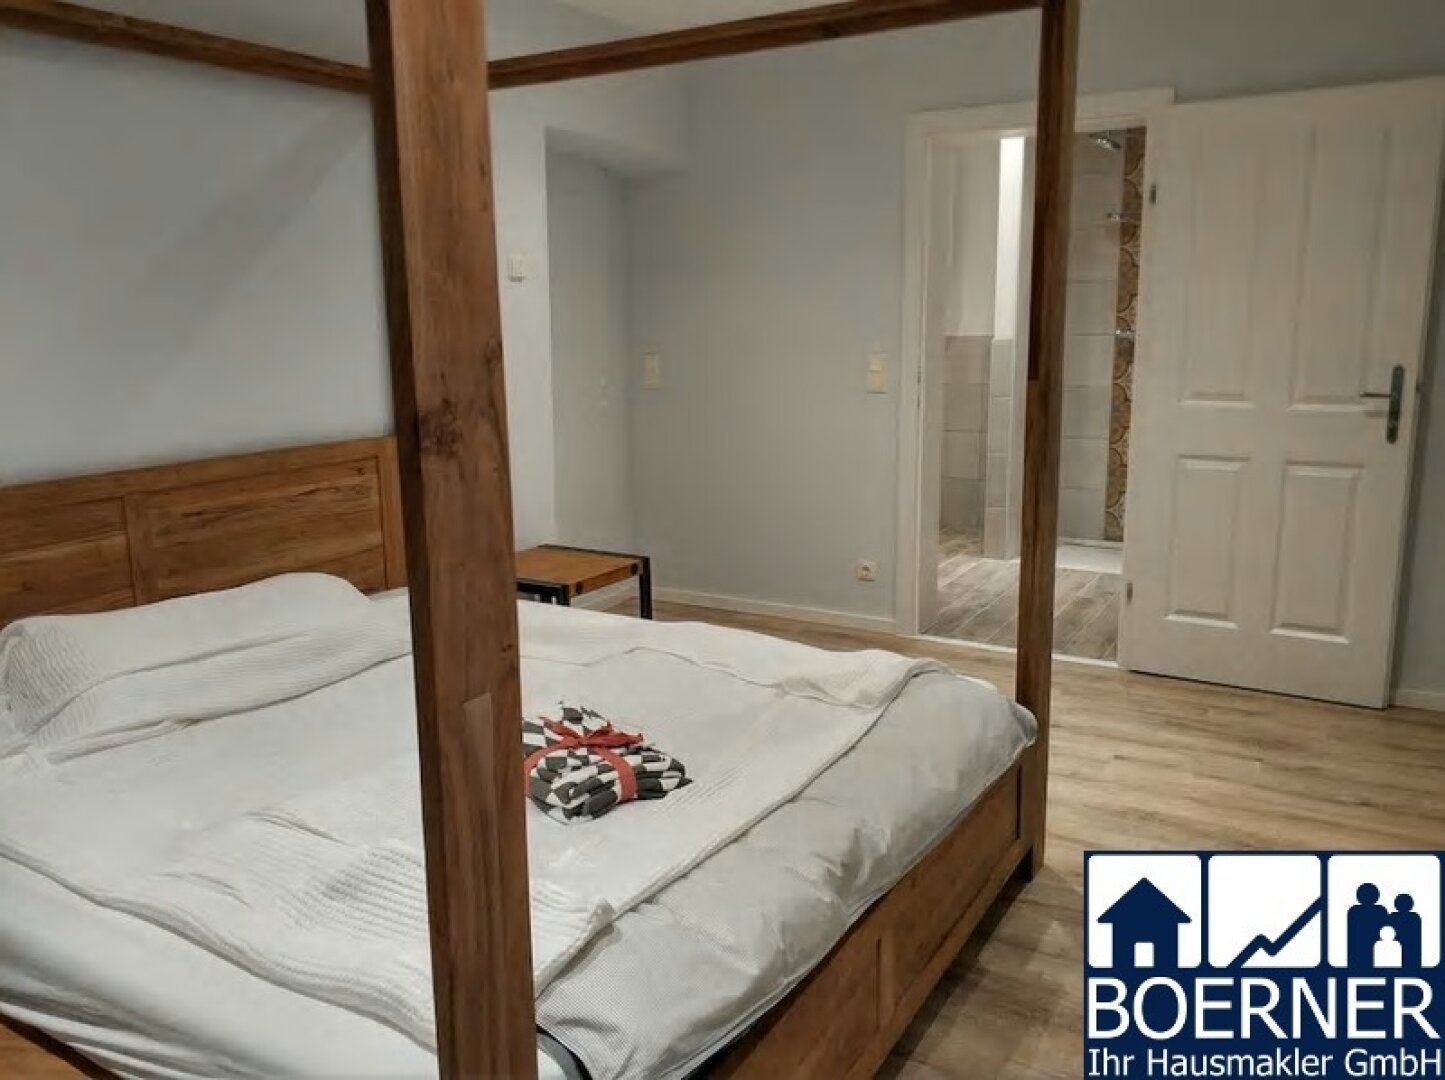 Hinterer Raum mit Doppelbett